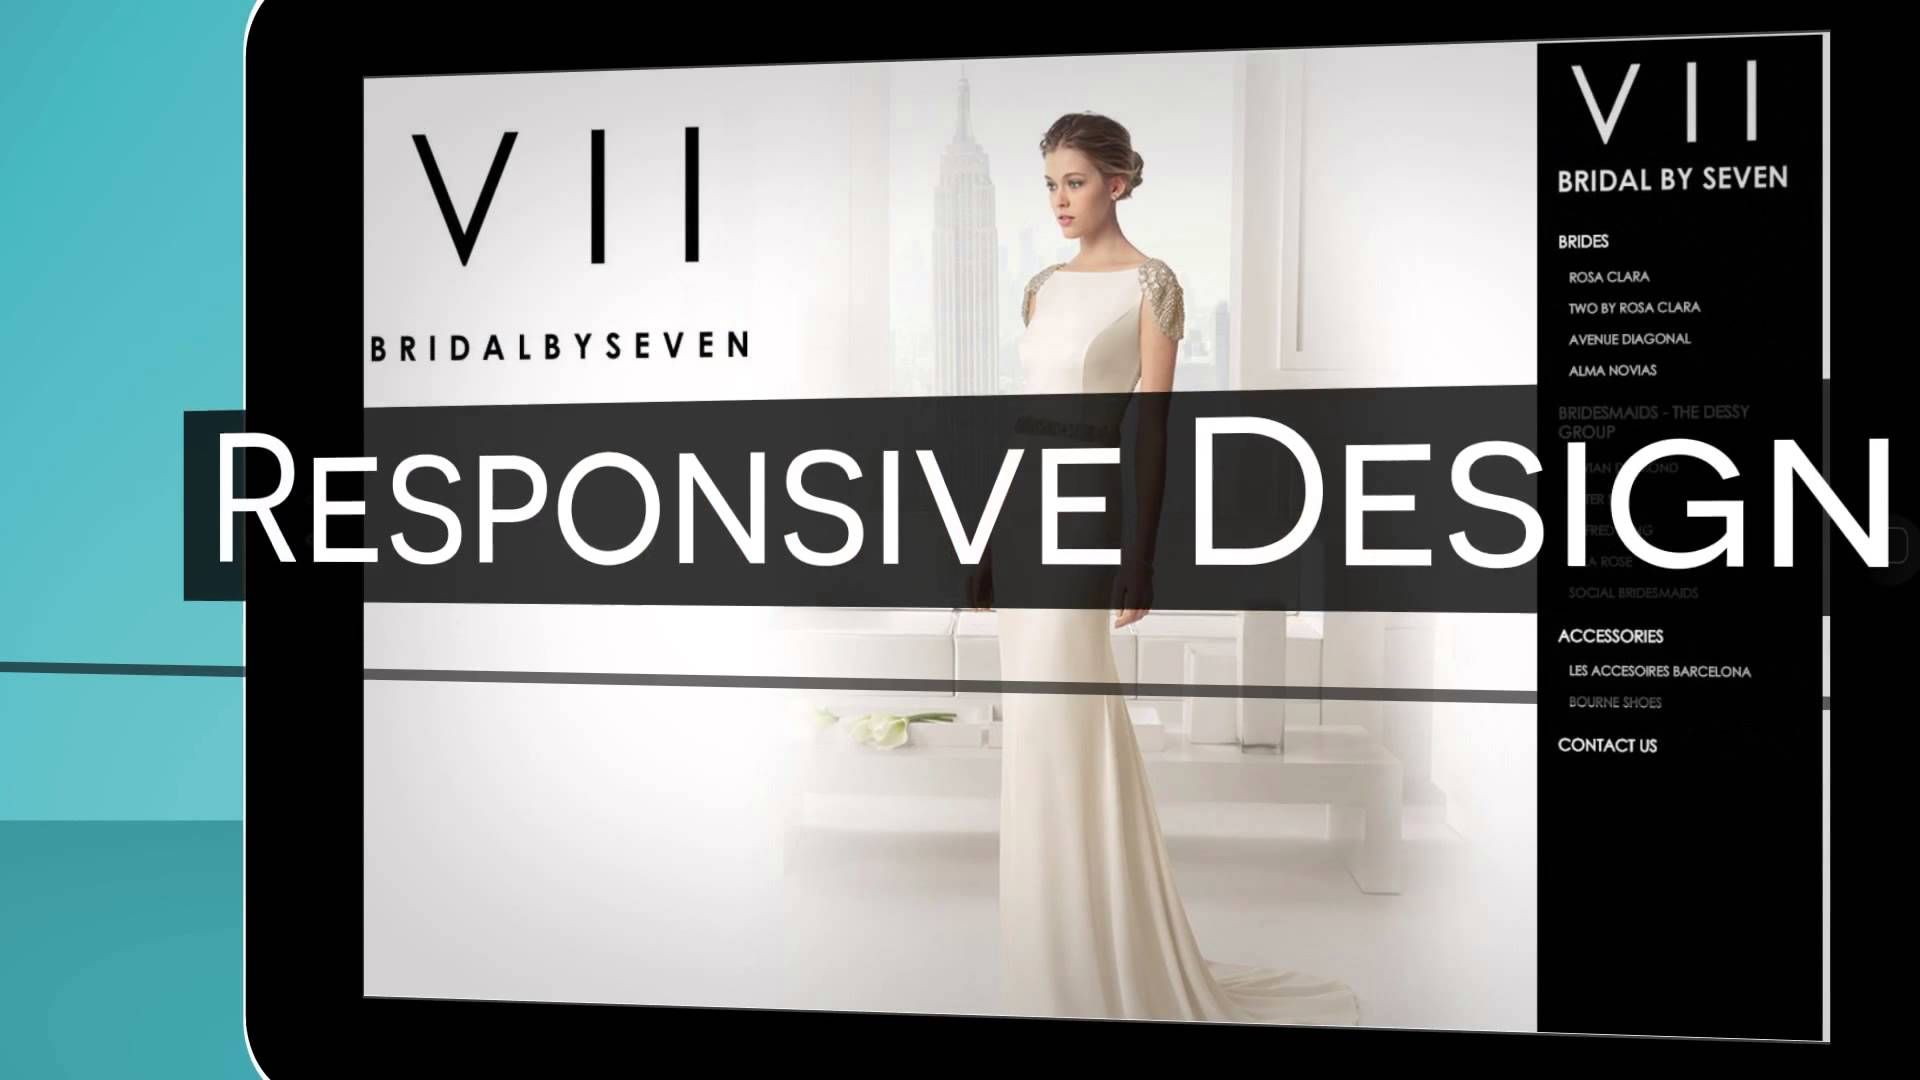 Web Design Newry Bridal By Seven Web Design Quotes Web Development Design Web Design